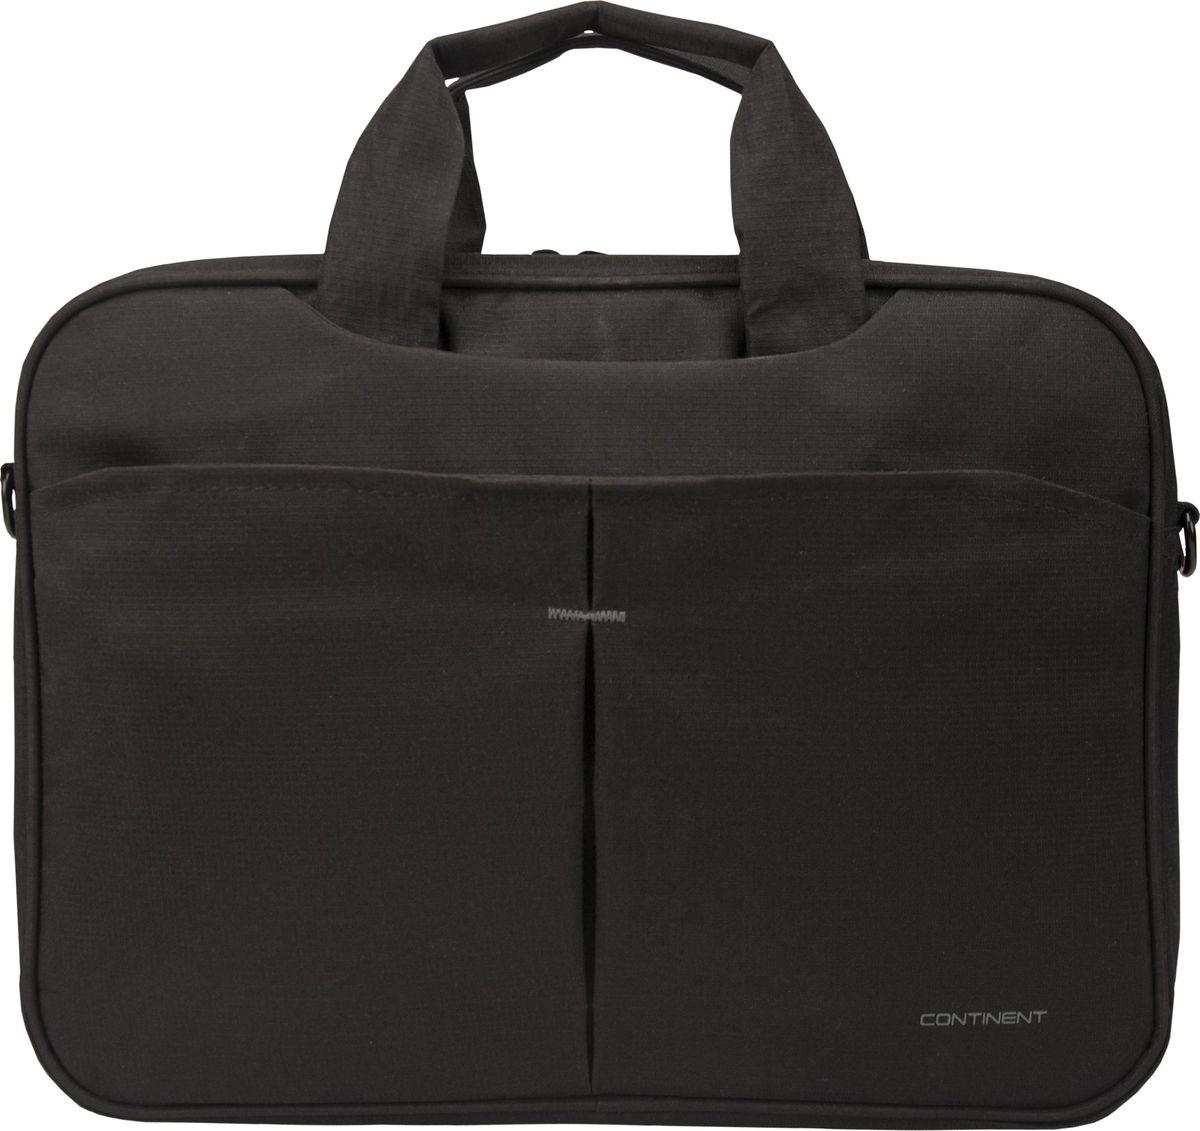 "Continent CC-014, Black сумка для ноутбука 13,3"""